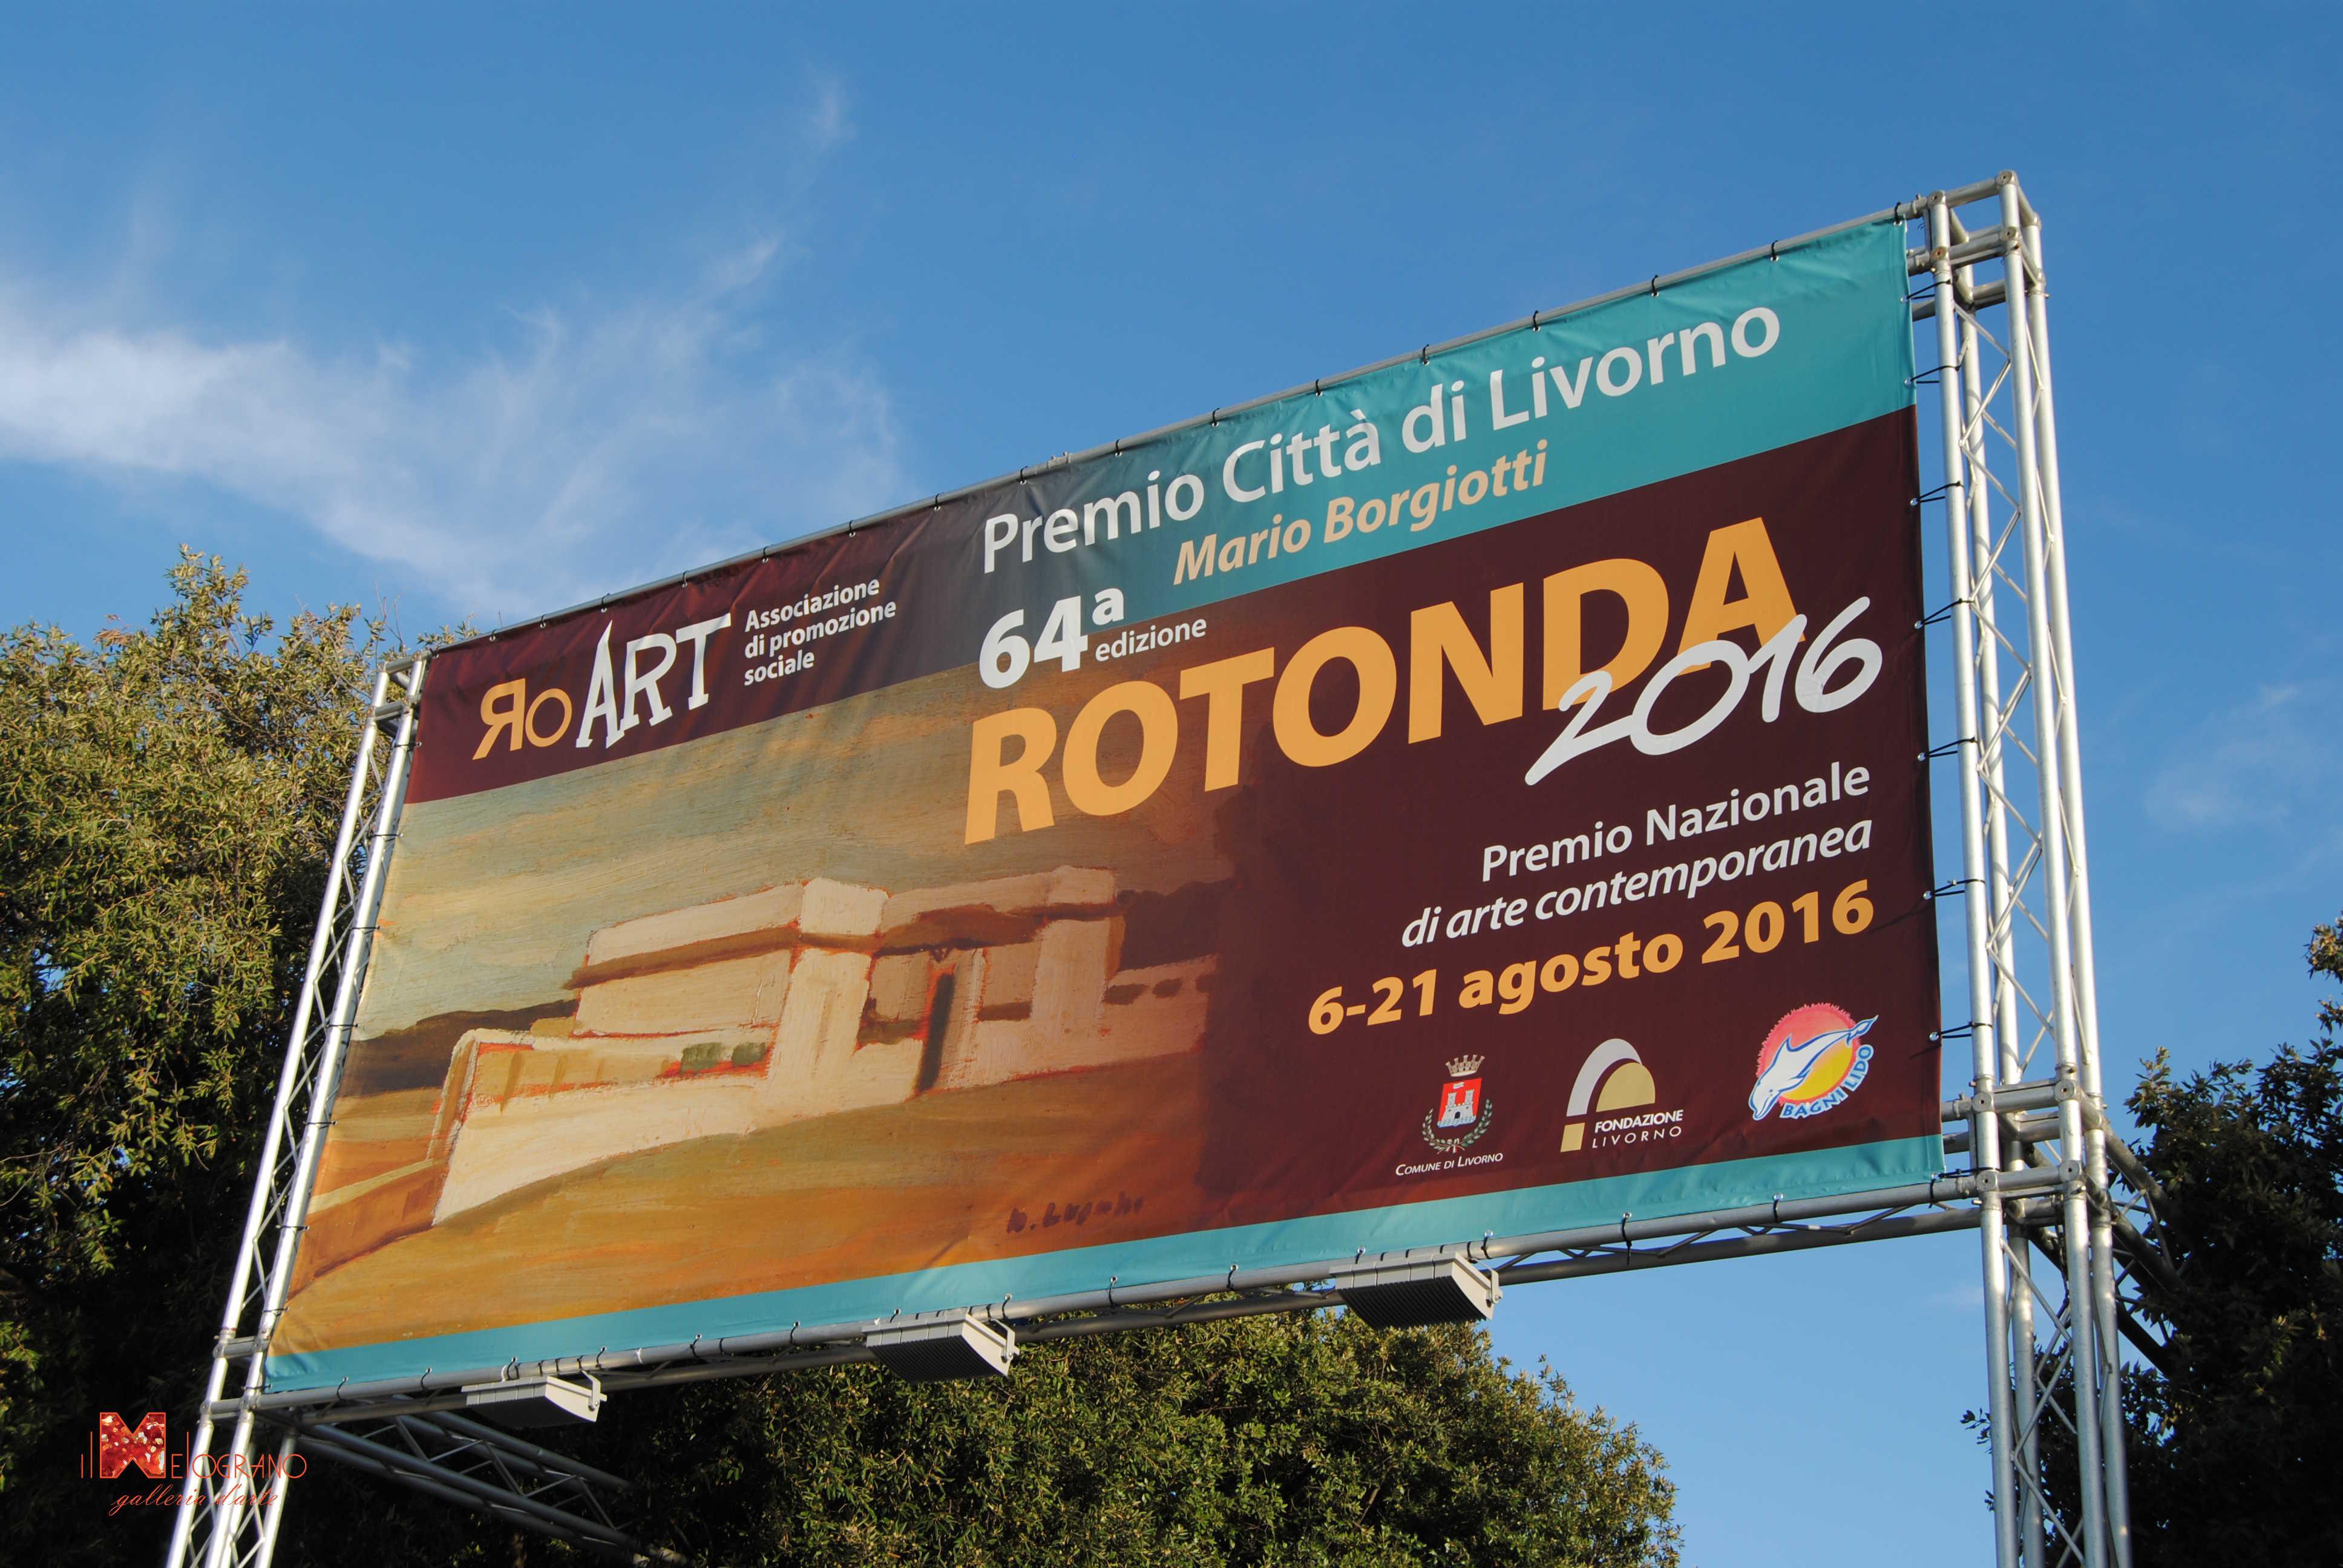 Premio Rotonda 2016 Livorno